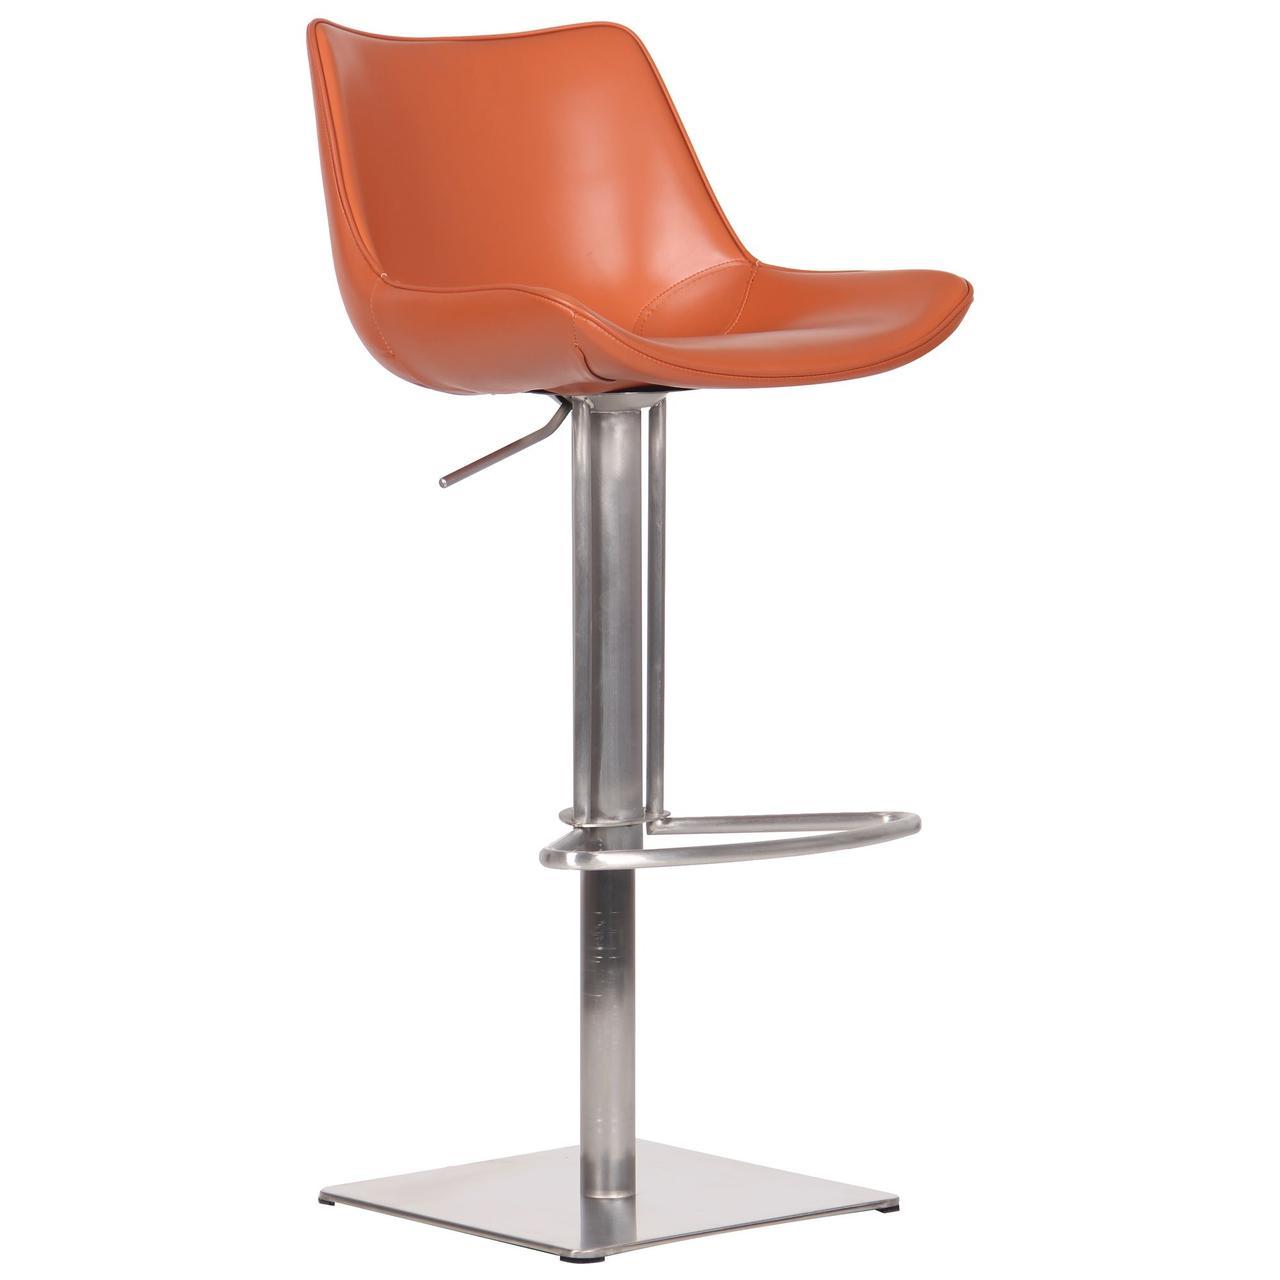 Барный стул Carner, caramel leather